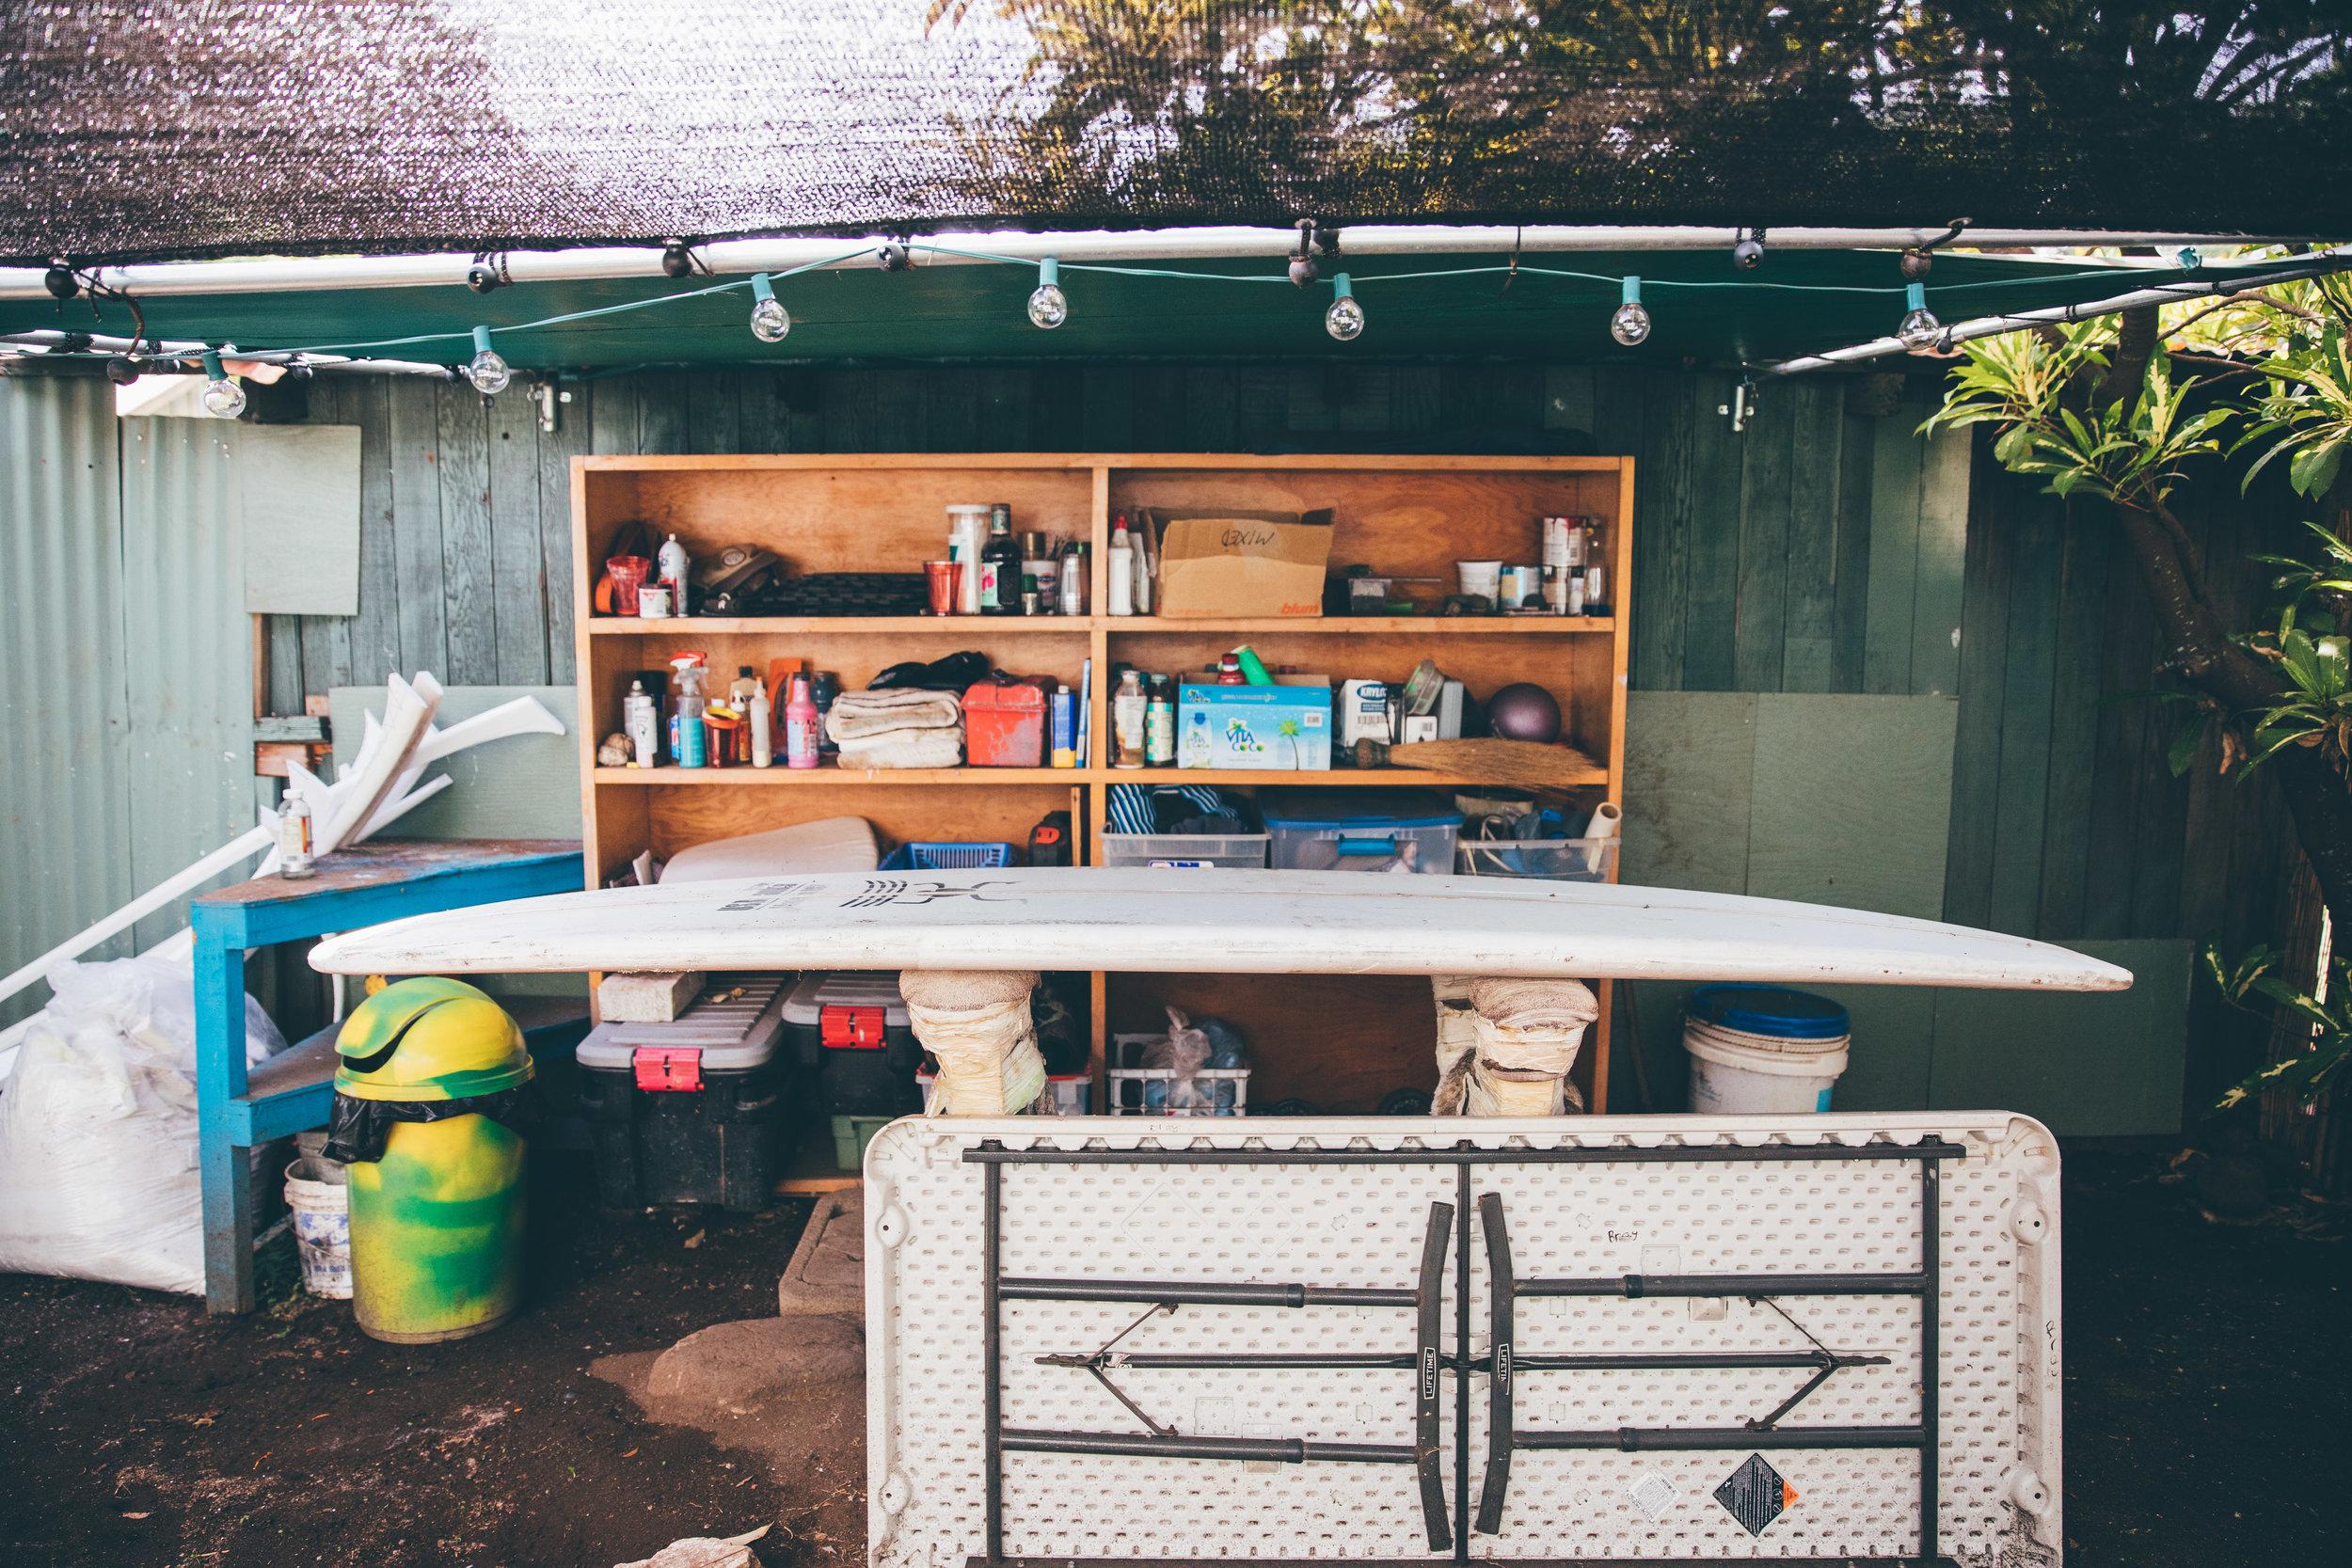 bryce johnson-photography-ebert surfboards-kauai-8.jpg